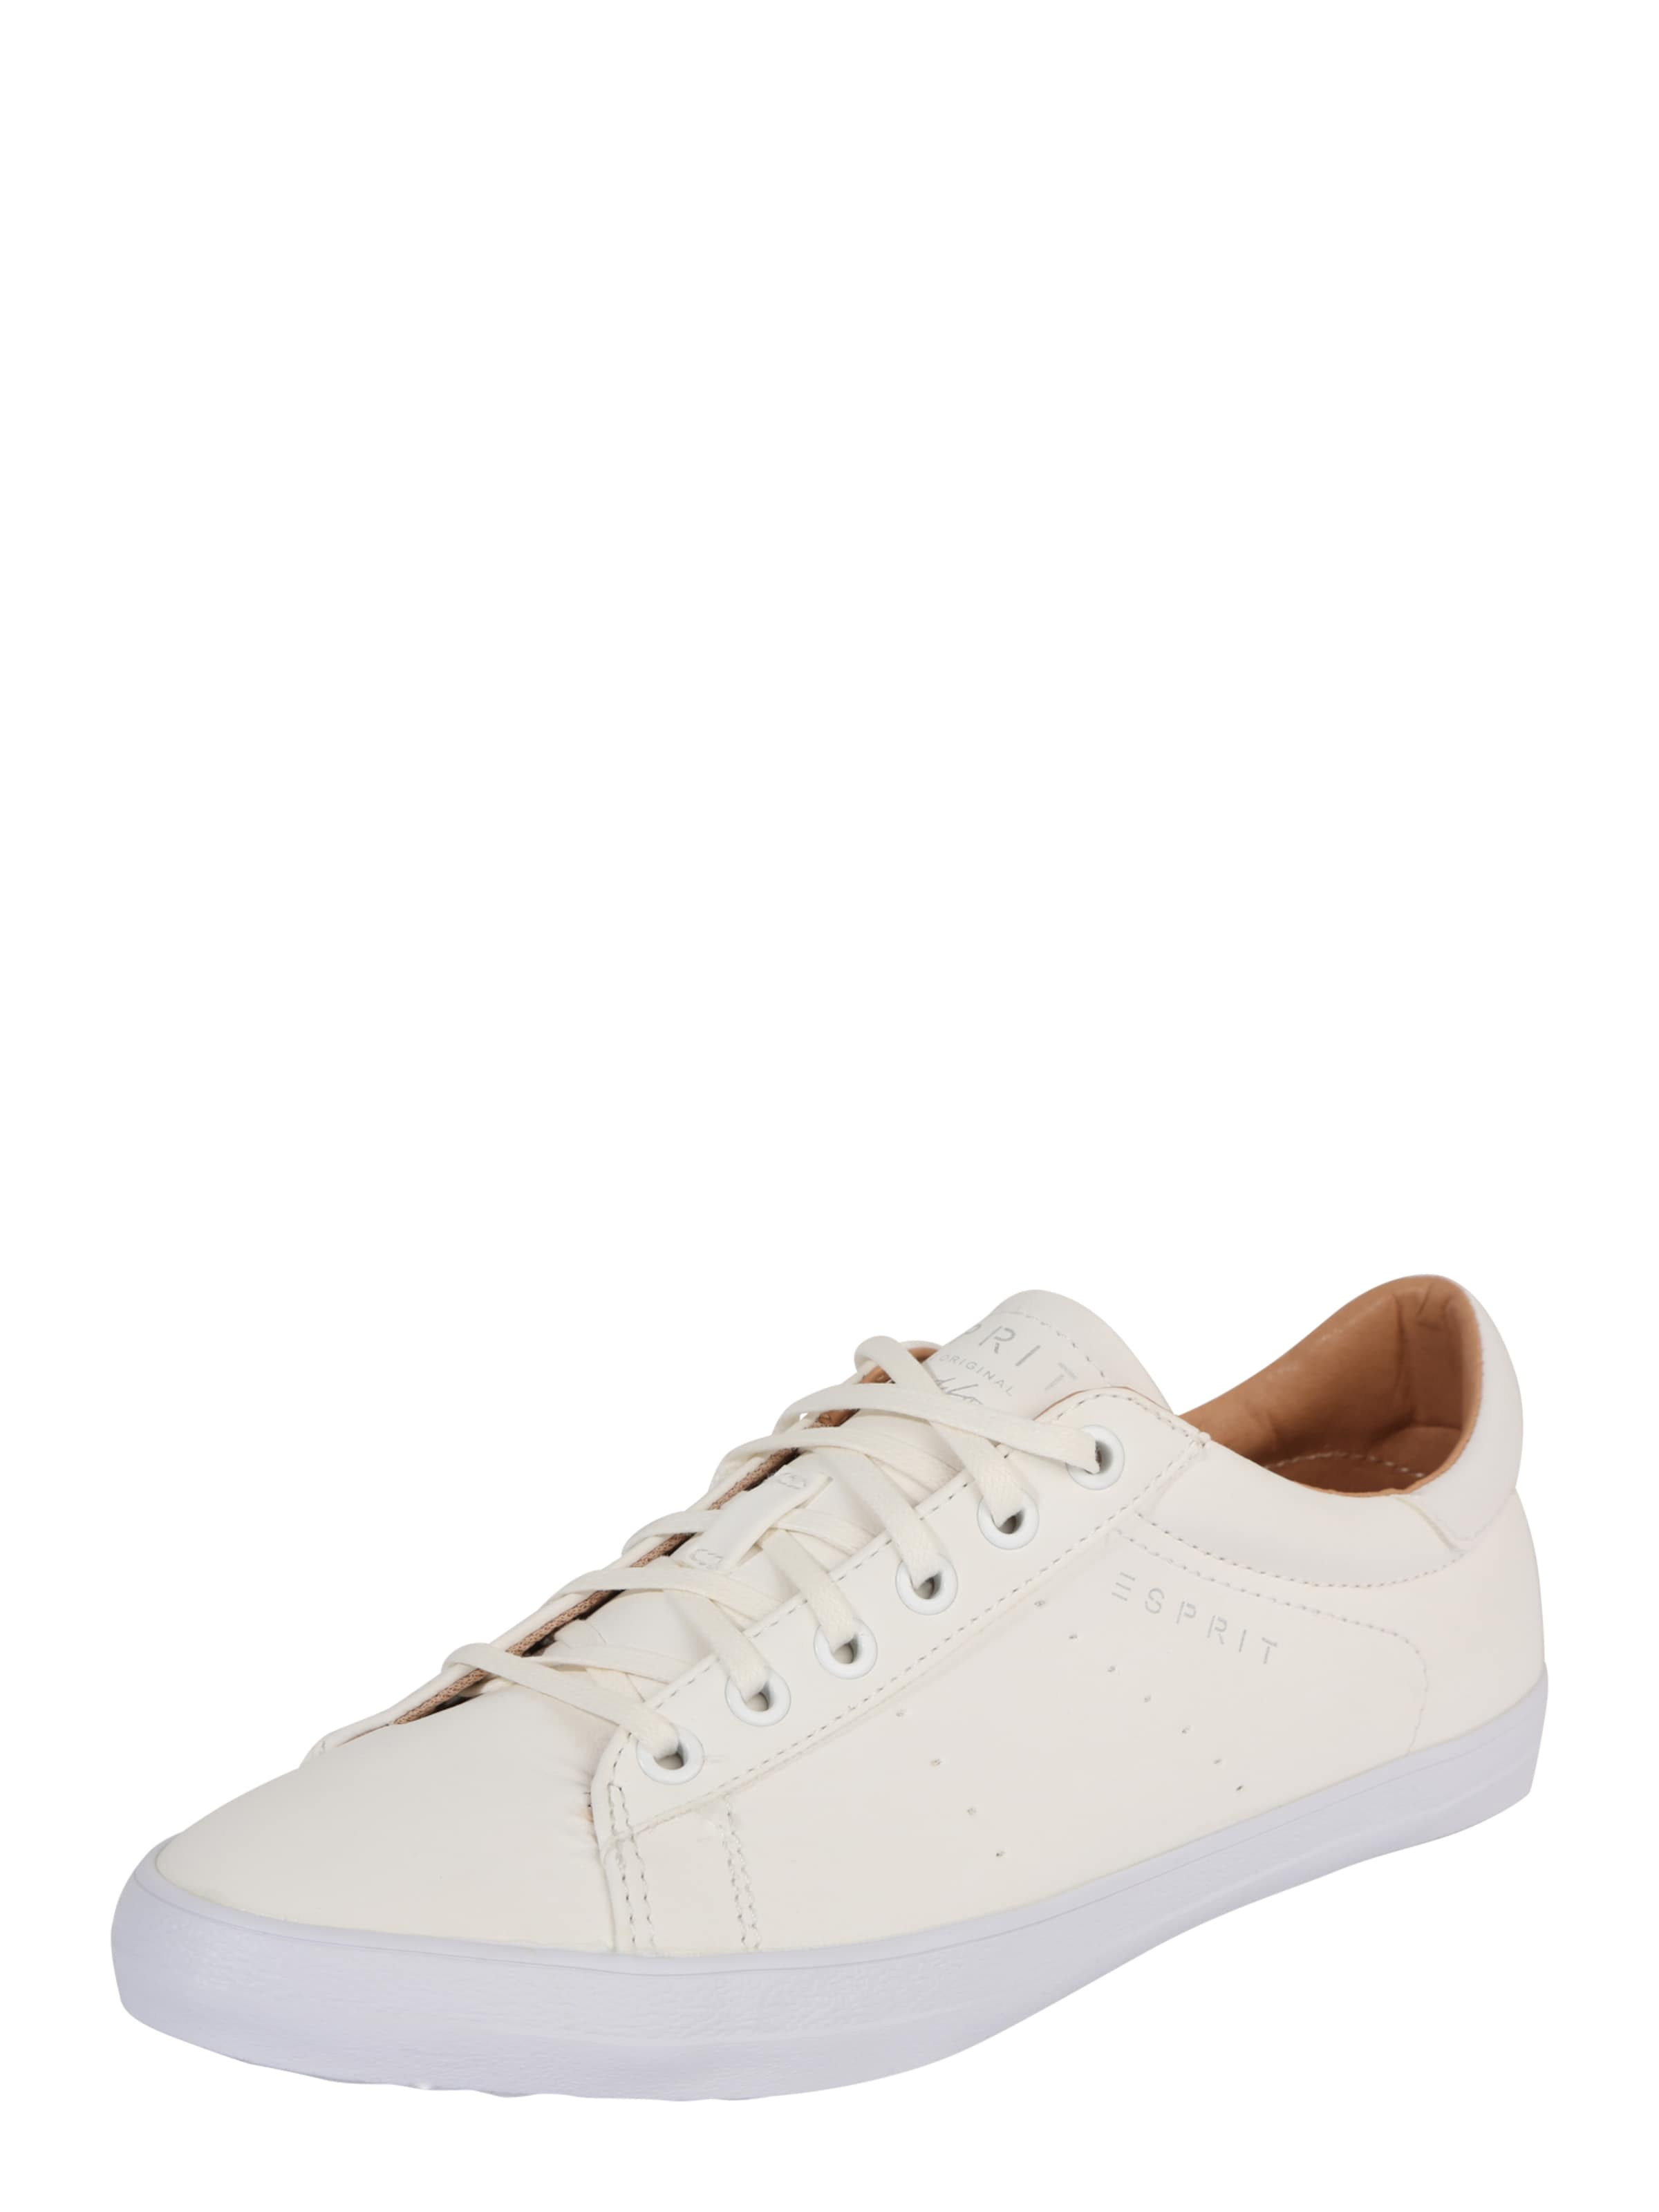 ESPRIT Sneaker Miana Lace up Hohe Qualität